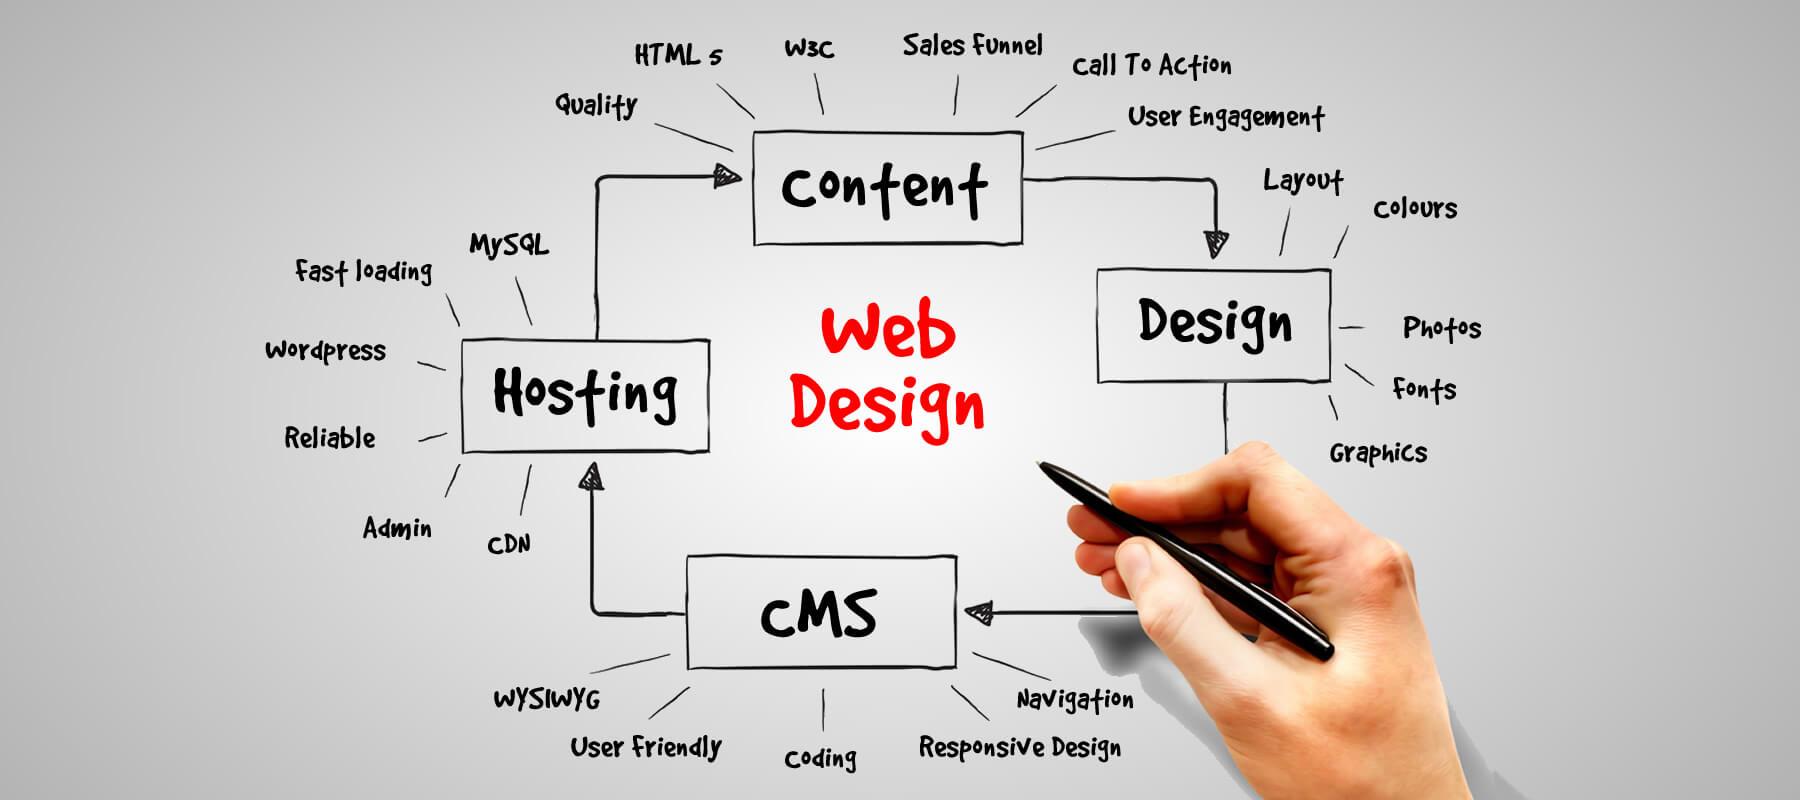 Deeho-web-design-page-banner-1[1]